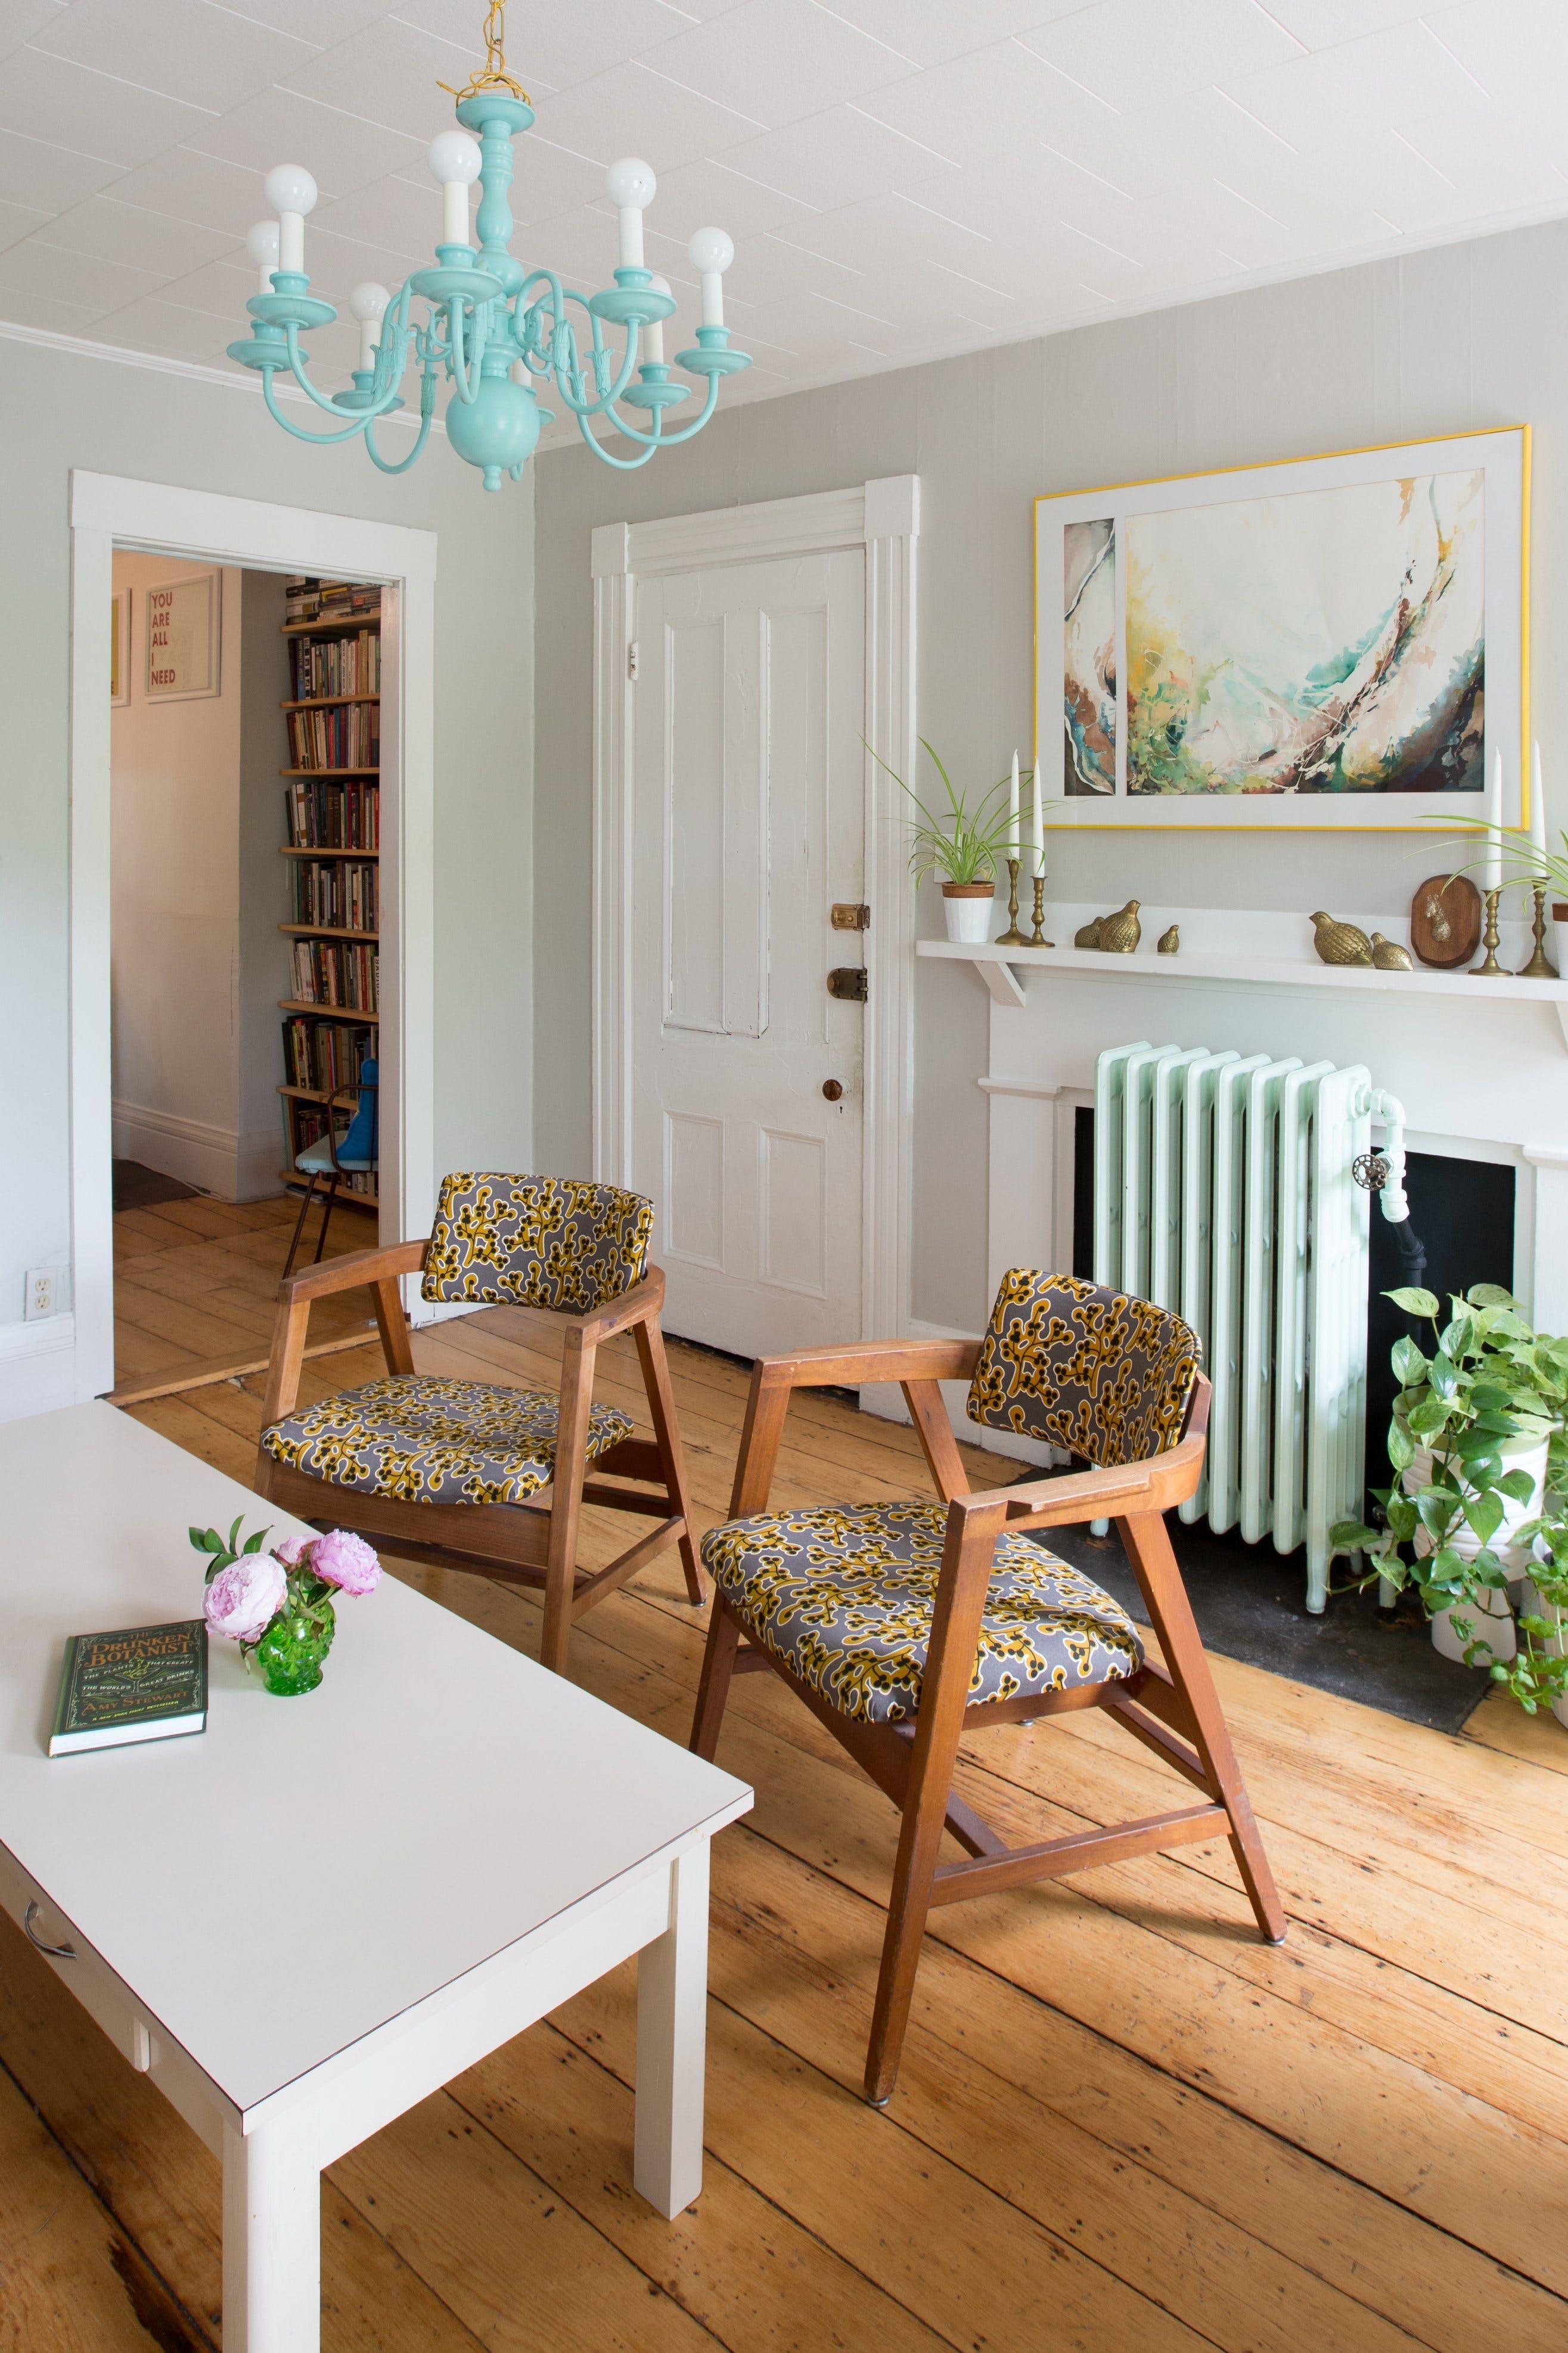 Ashley bryans northern comfort selling furniture